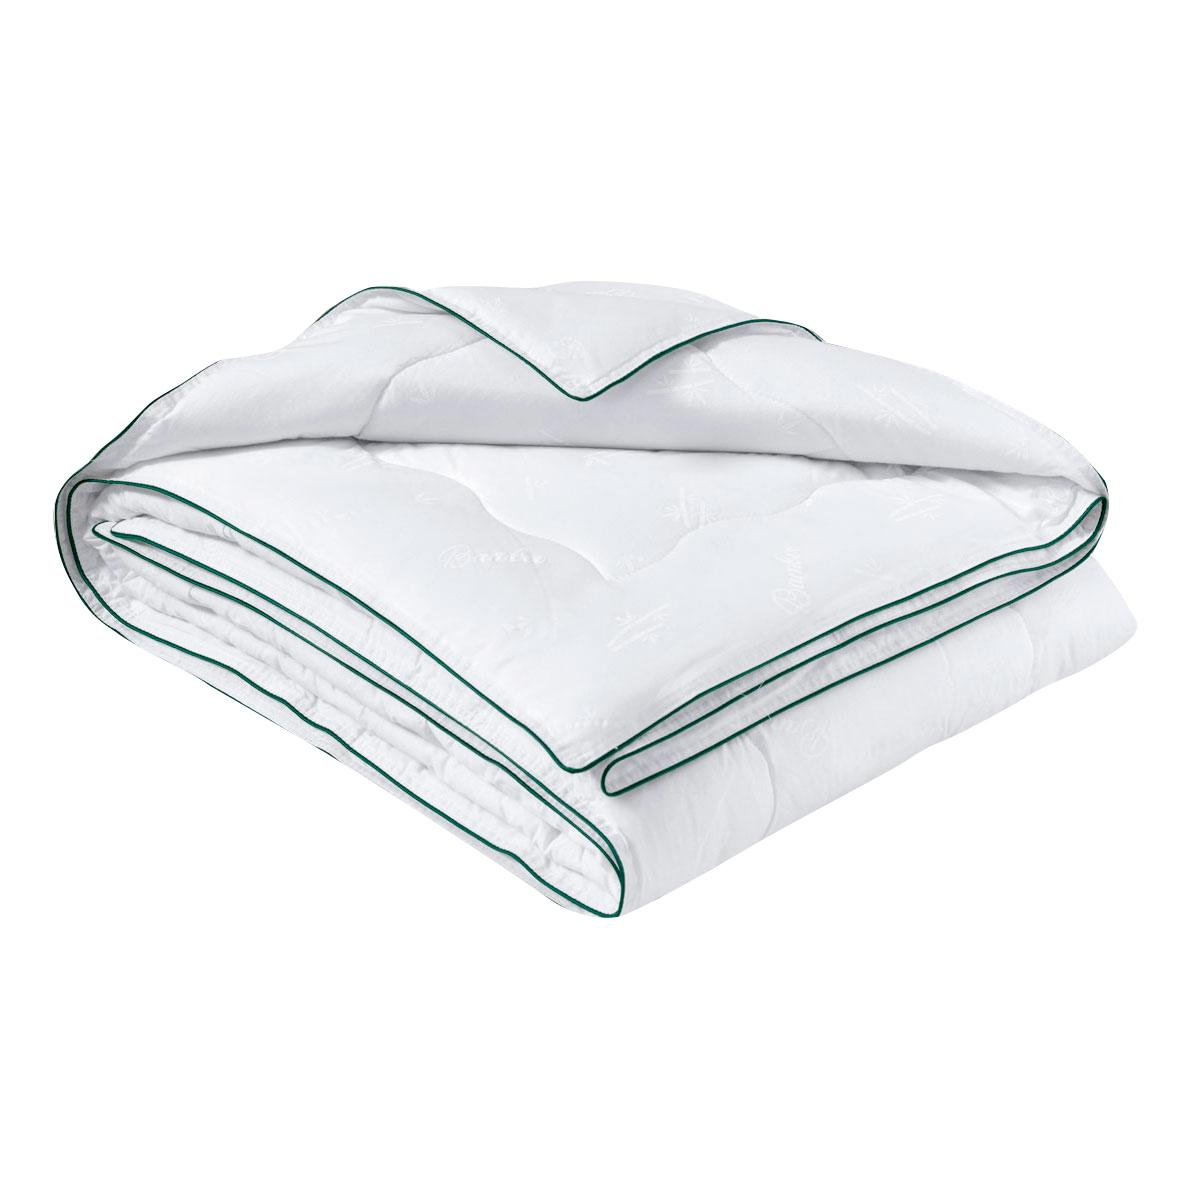 Одеяло Arya home collection 215х155 см бамбук нано волокно